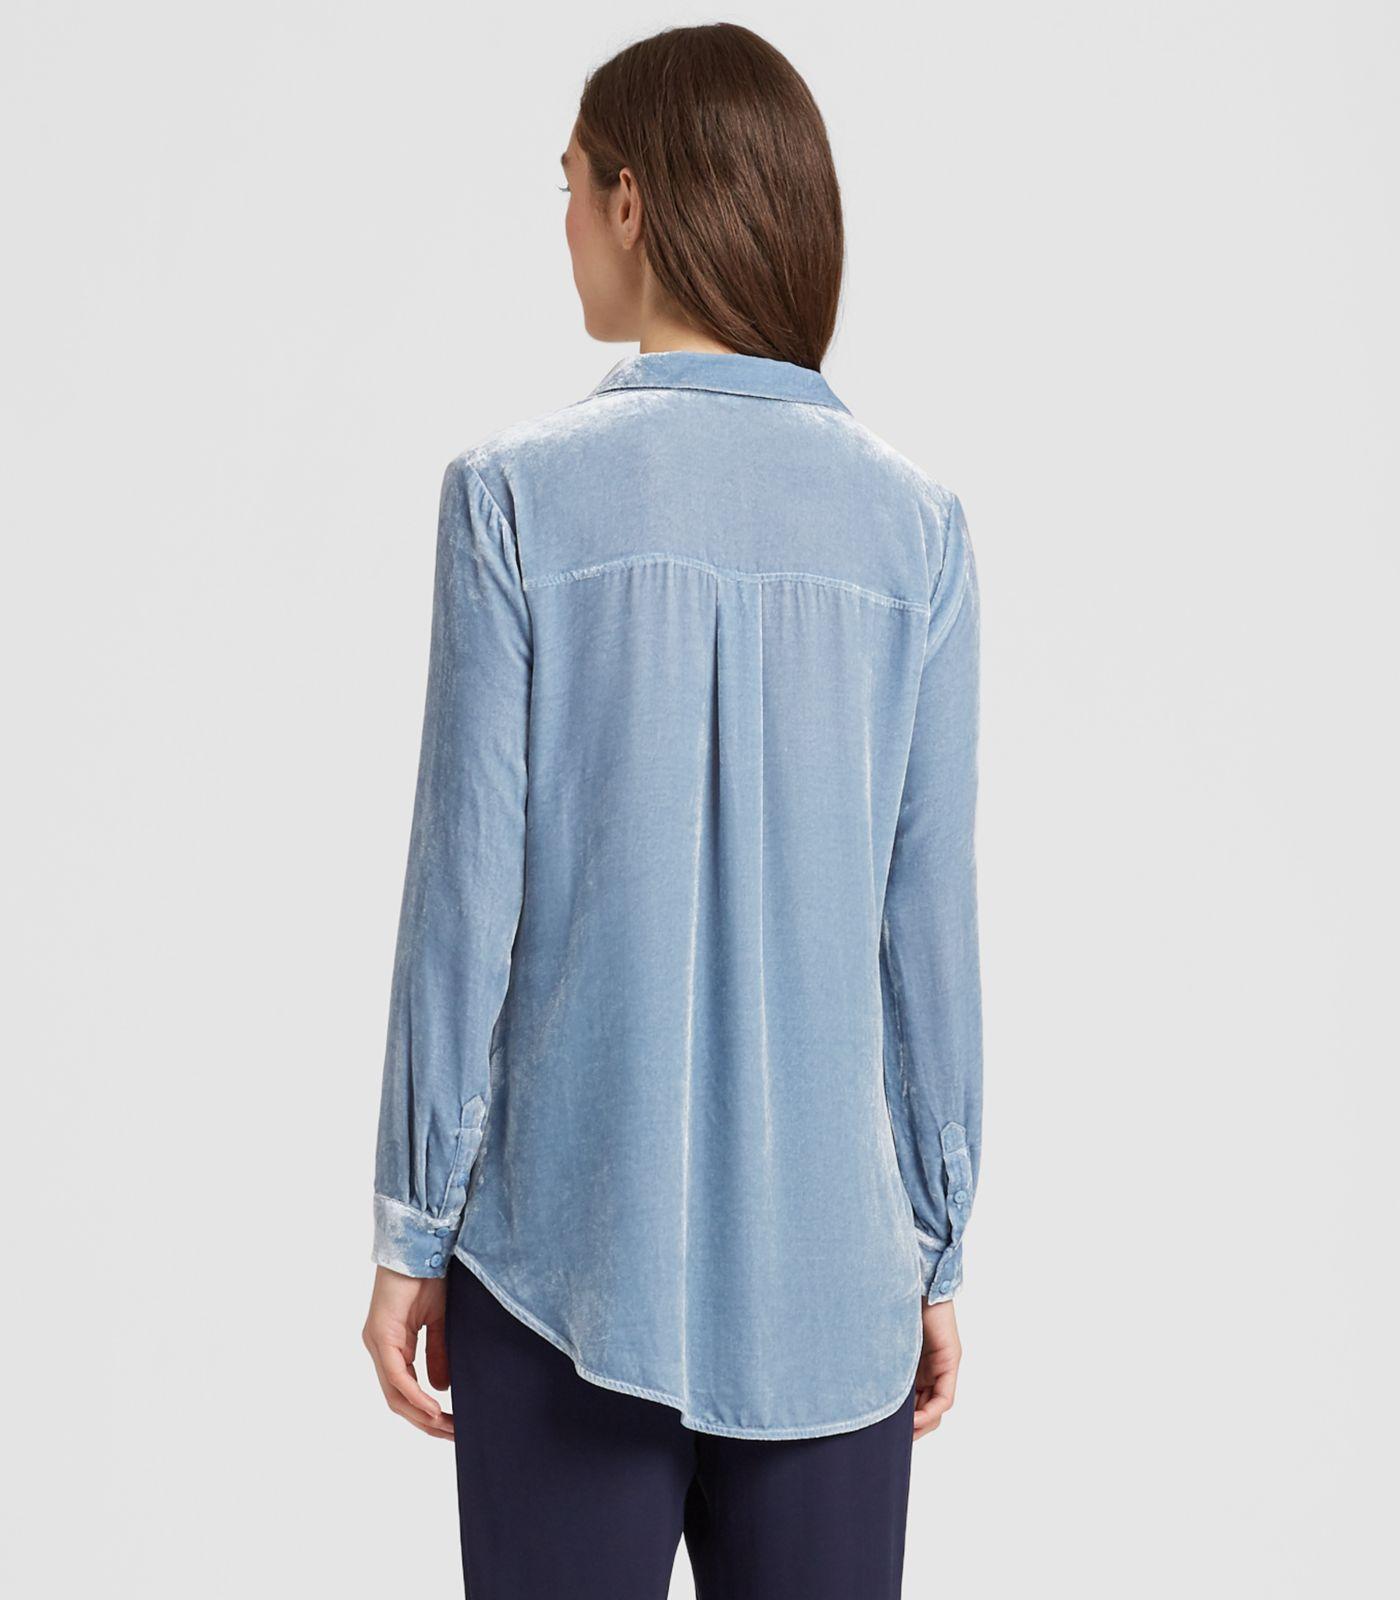 806496120f9e3 Eileen Fisher - Blue Velvet Classic Collar Shirt - Lyst. View fullscreen